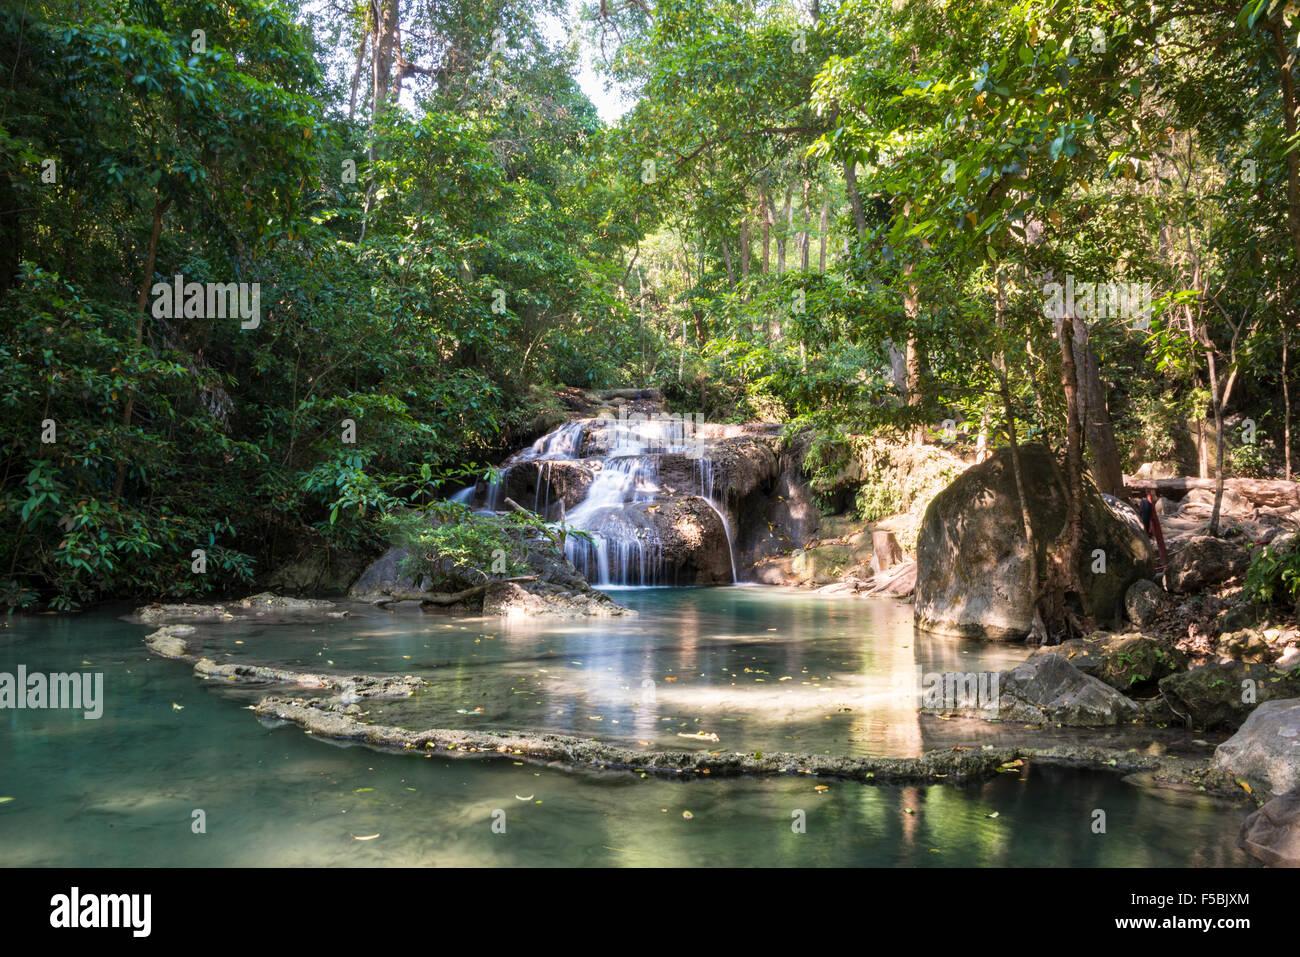 Waterfall in Erawan National Park, Kanchanaburi Province, Thailand - Stock Image